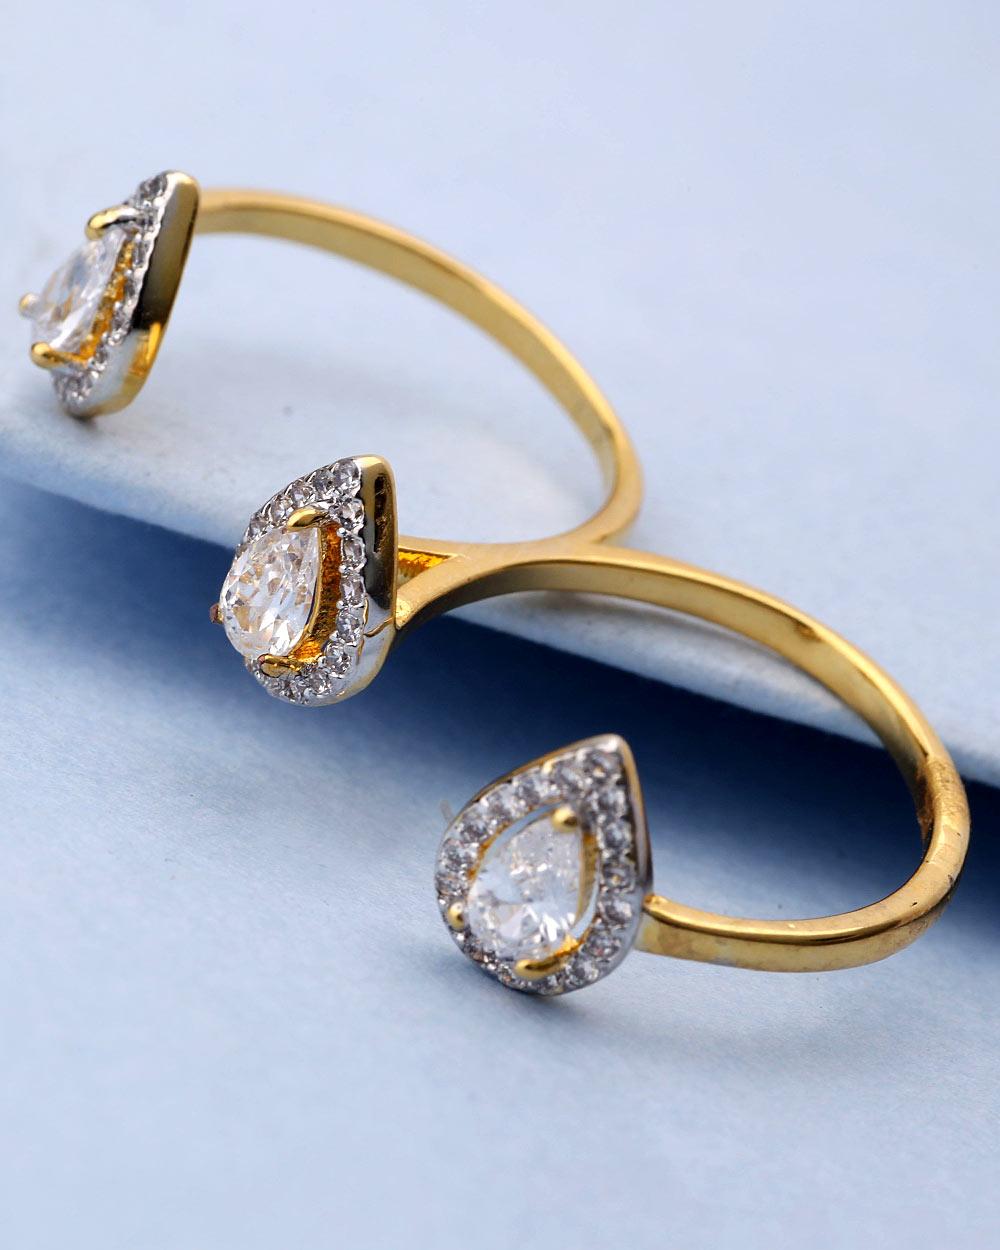 Buy Double Finger Ring Design For Women Online India | Voylla